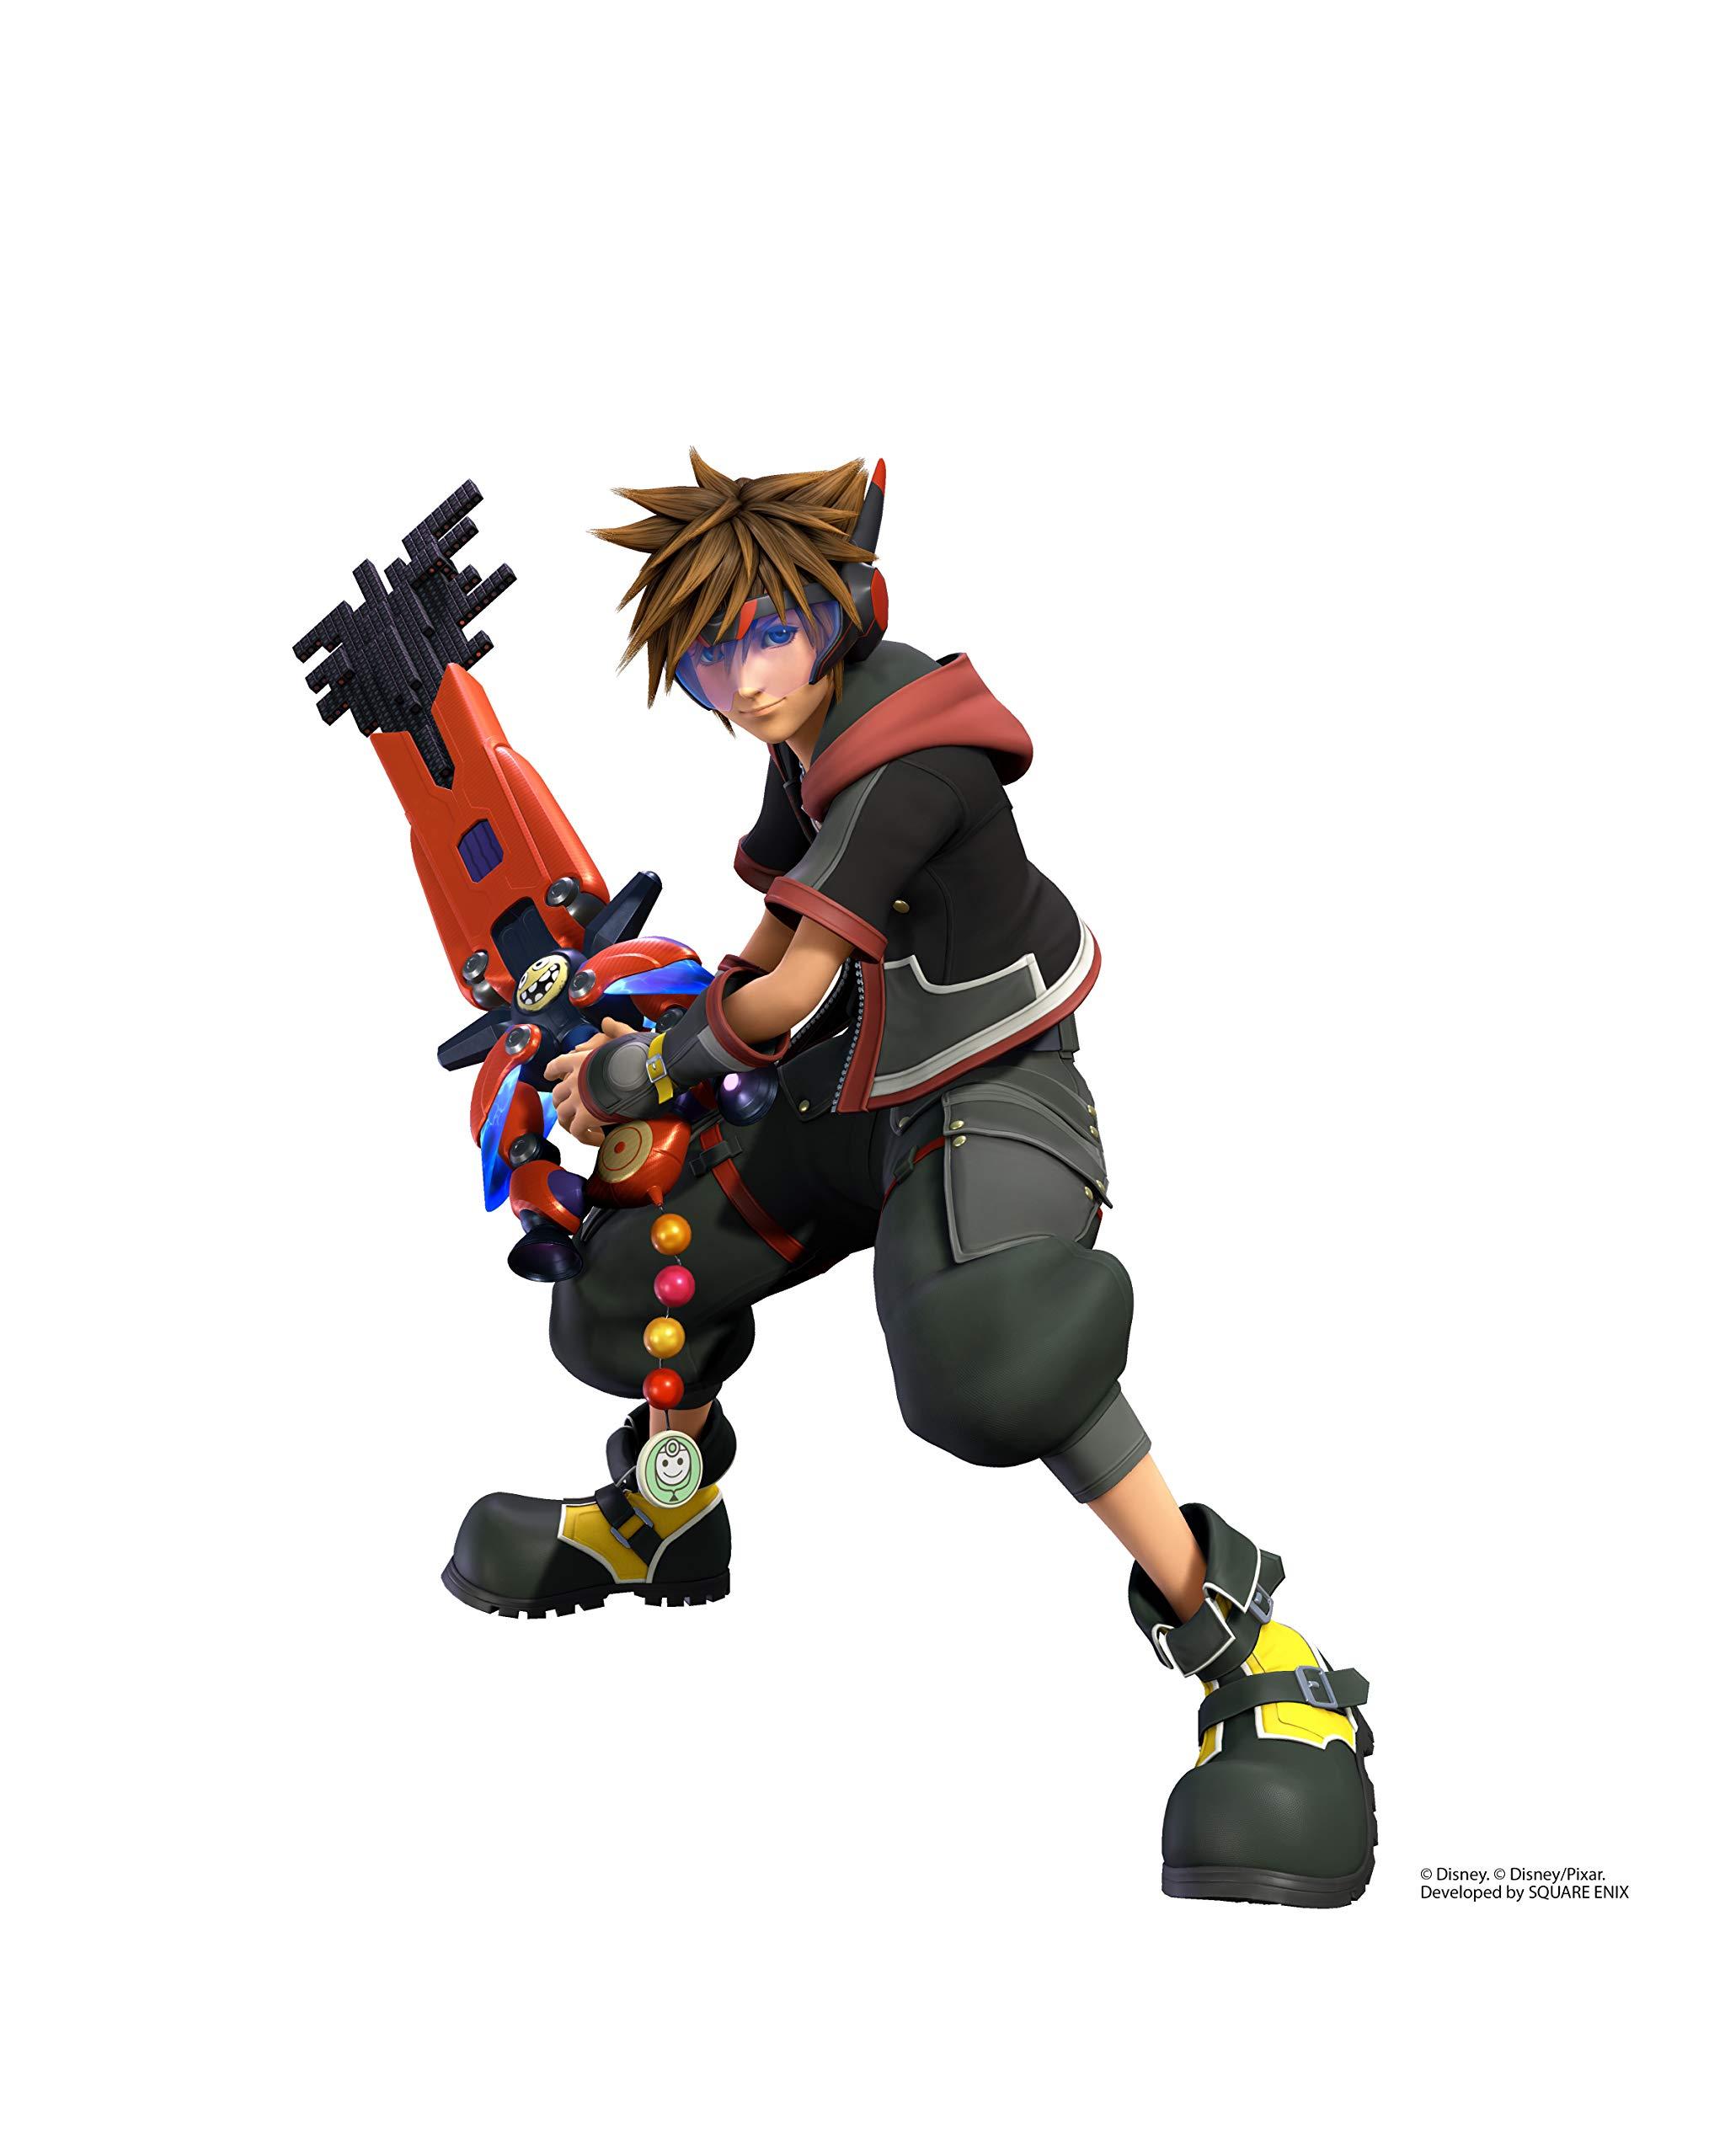 Kingdom Hearts III - Xbox One by Square Enix (Image #34)